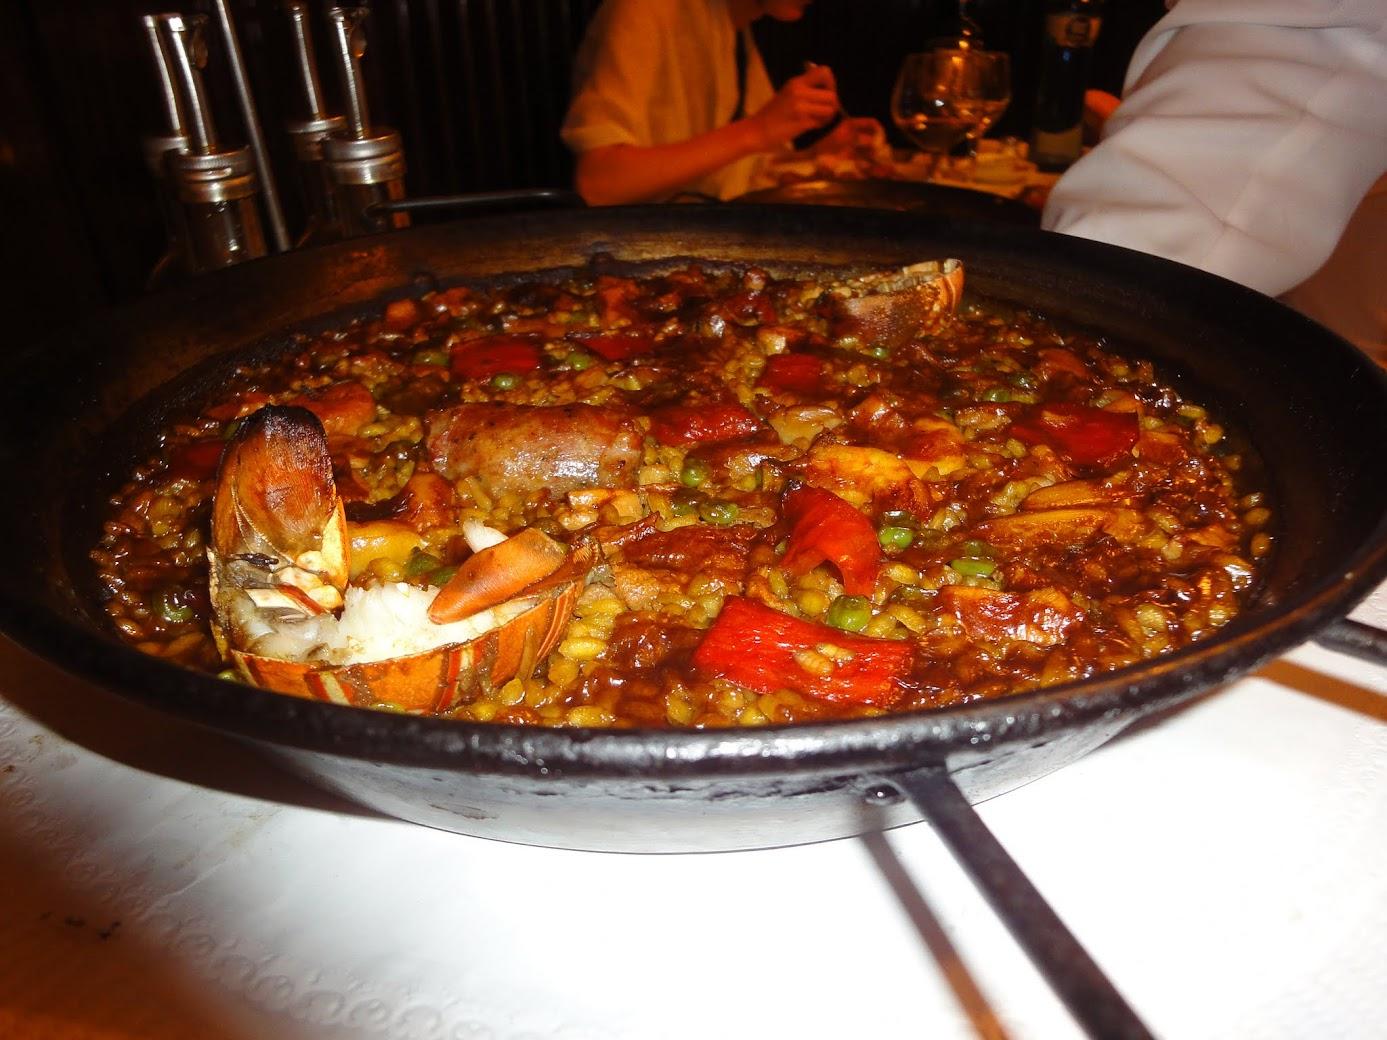 Paella au Restaurant 7 Portes à Barcelone